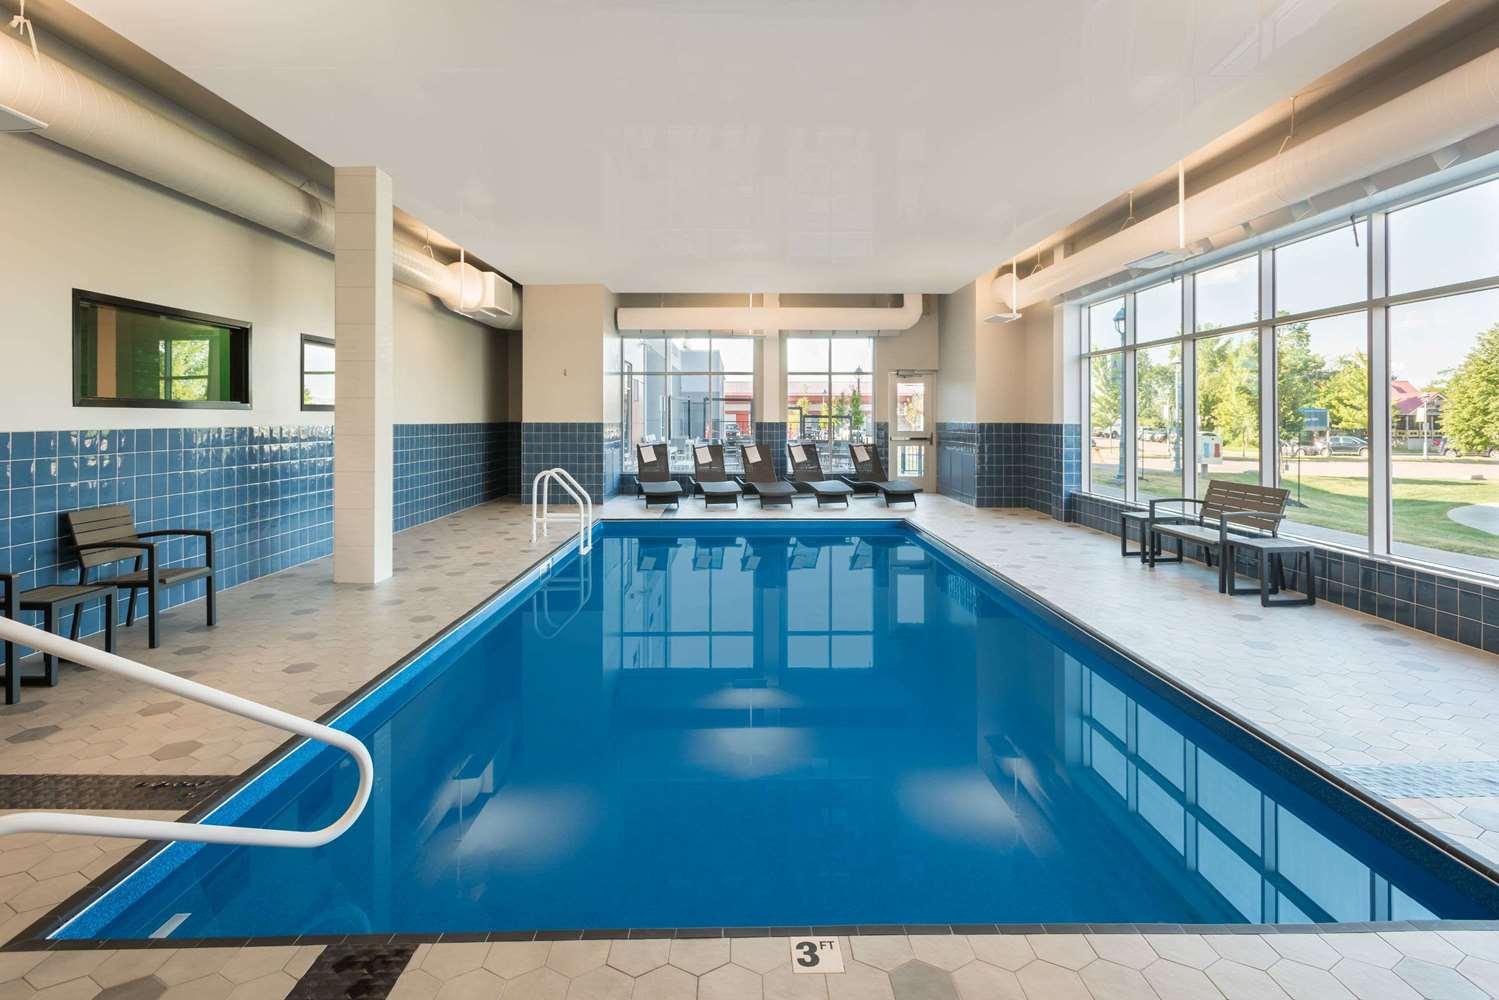 Pool - Wingate by Wyndham Hotel Dieppe